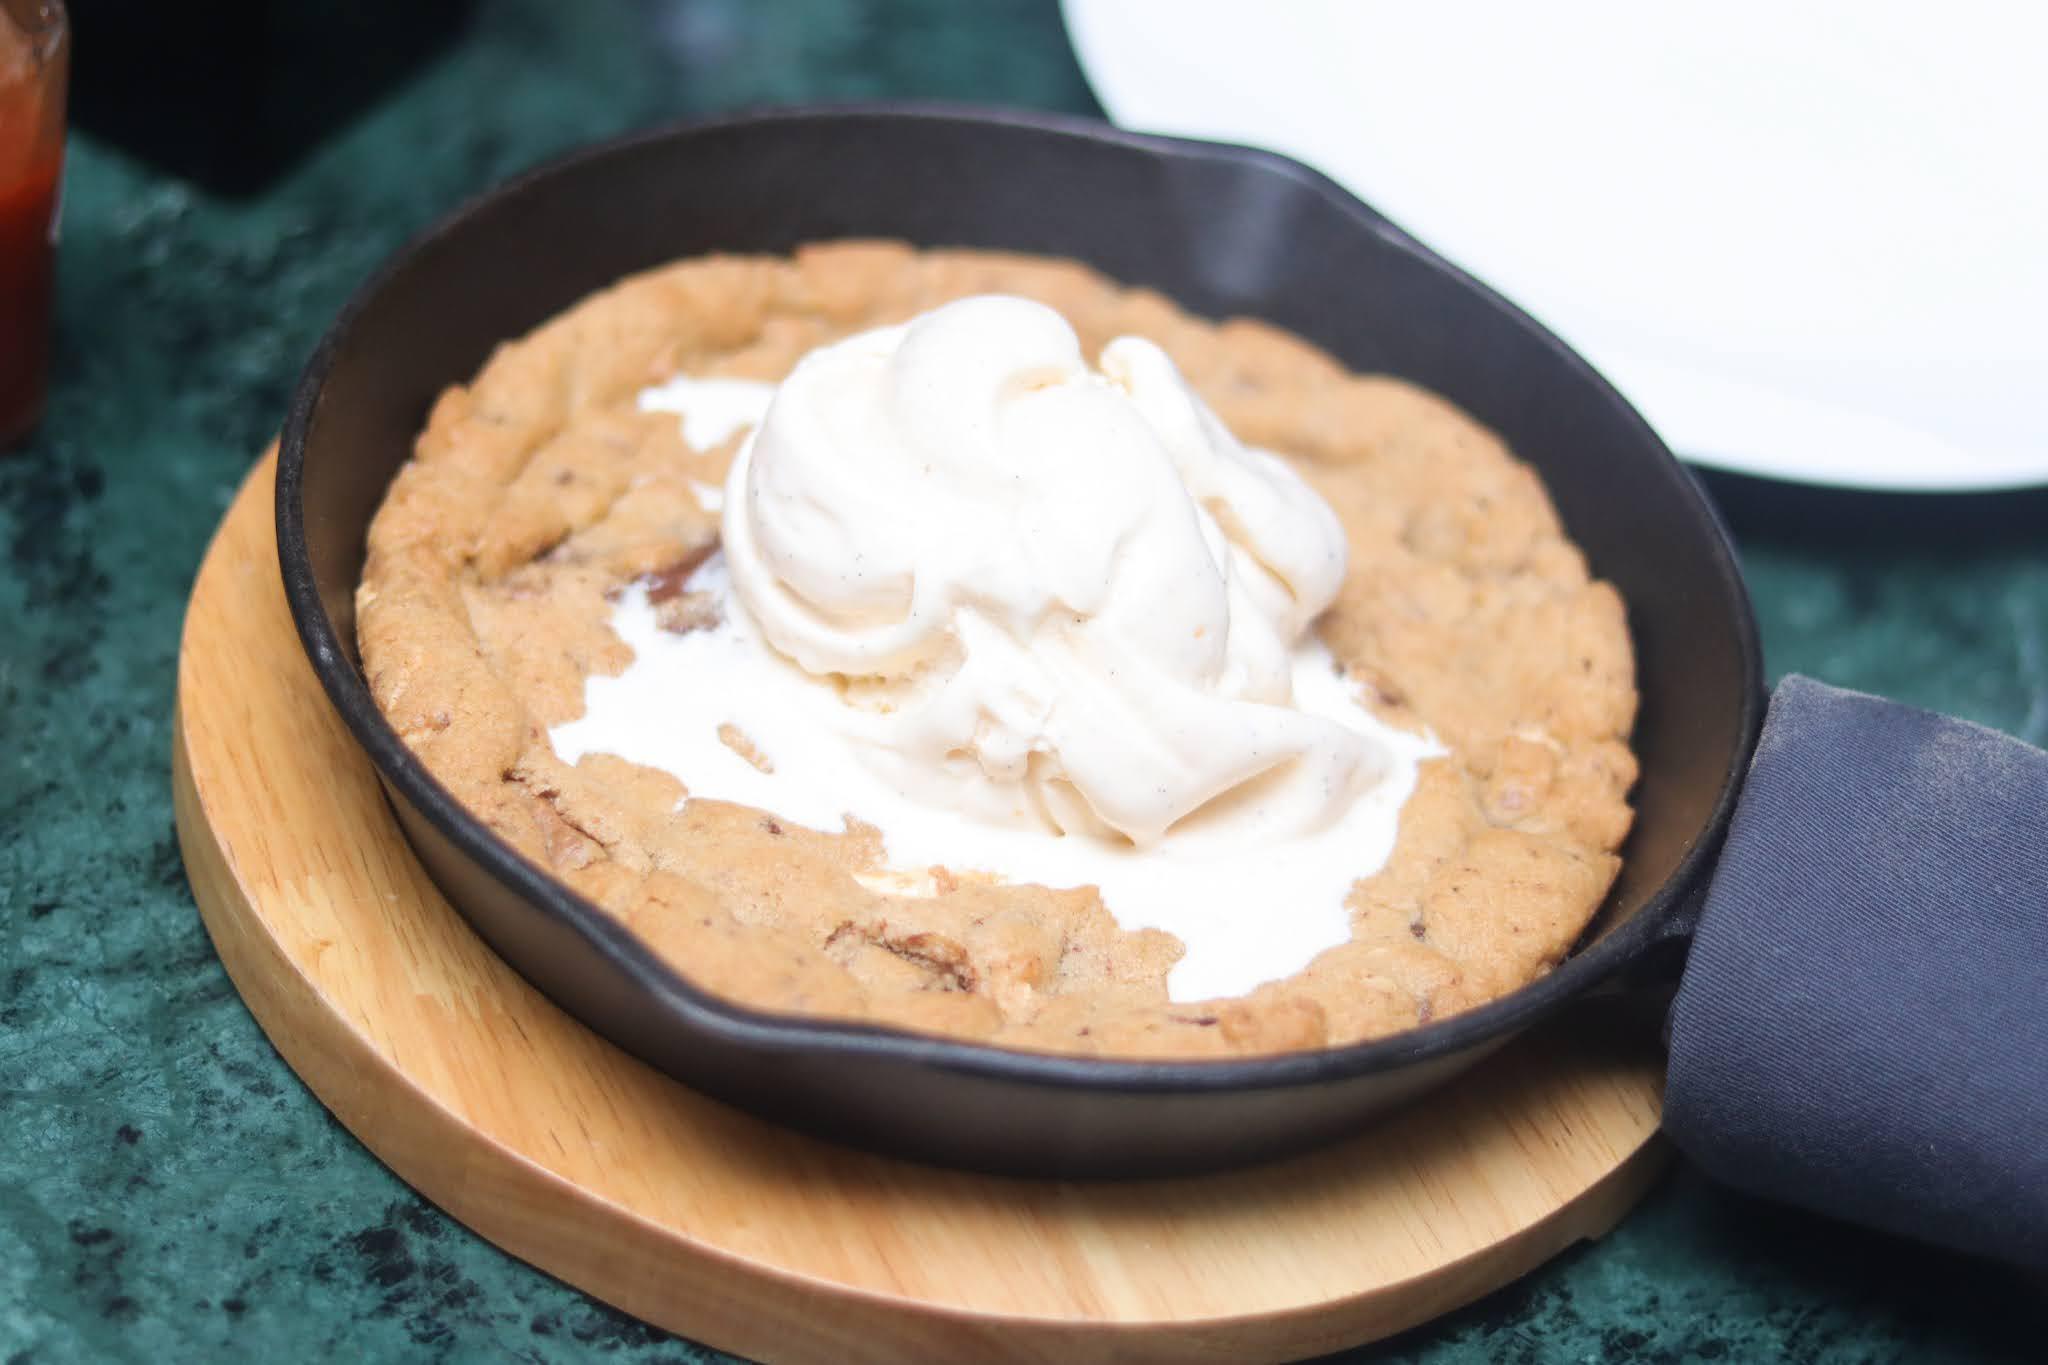 warm cookie and icecream